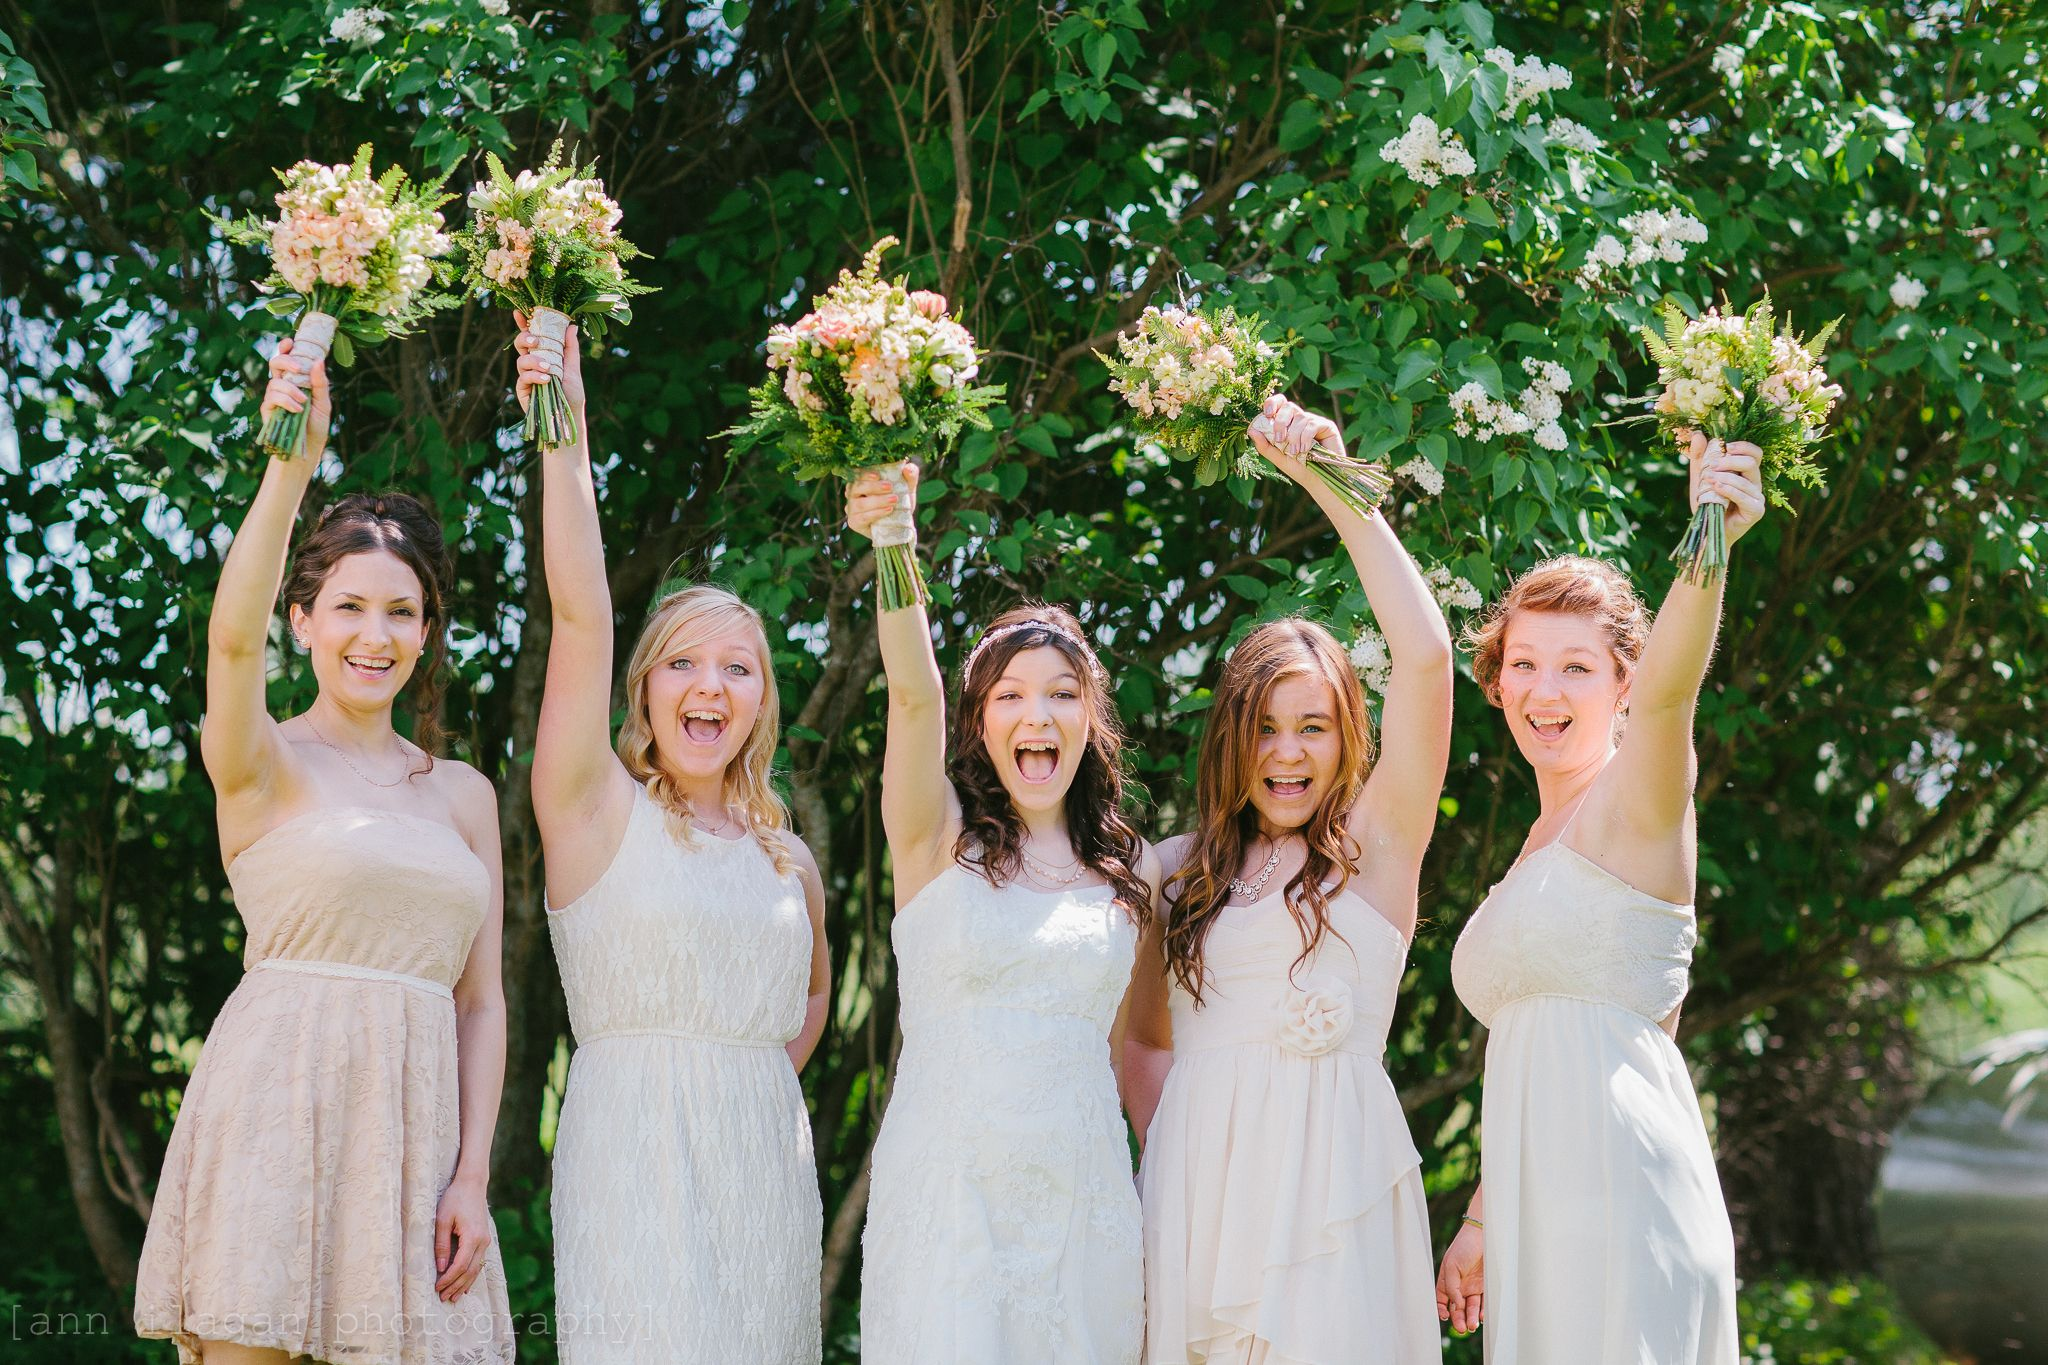 Bridesmaids pose | Rustic | Mismatched dresses | Fun pose | Rudolph, WI